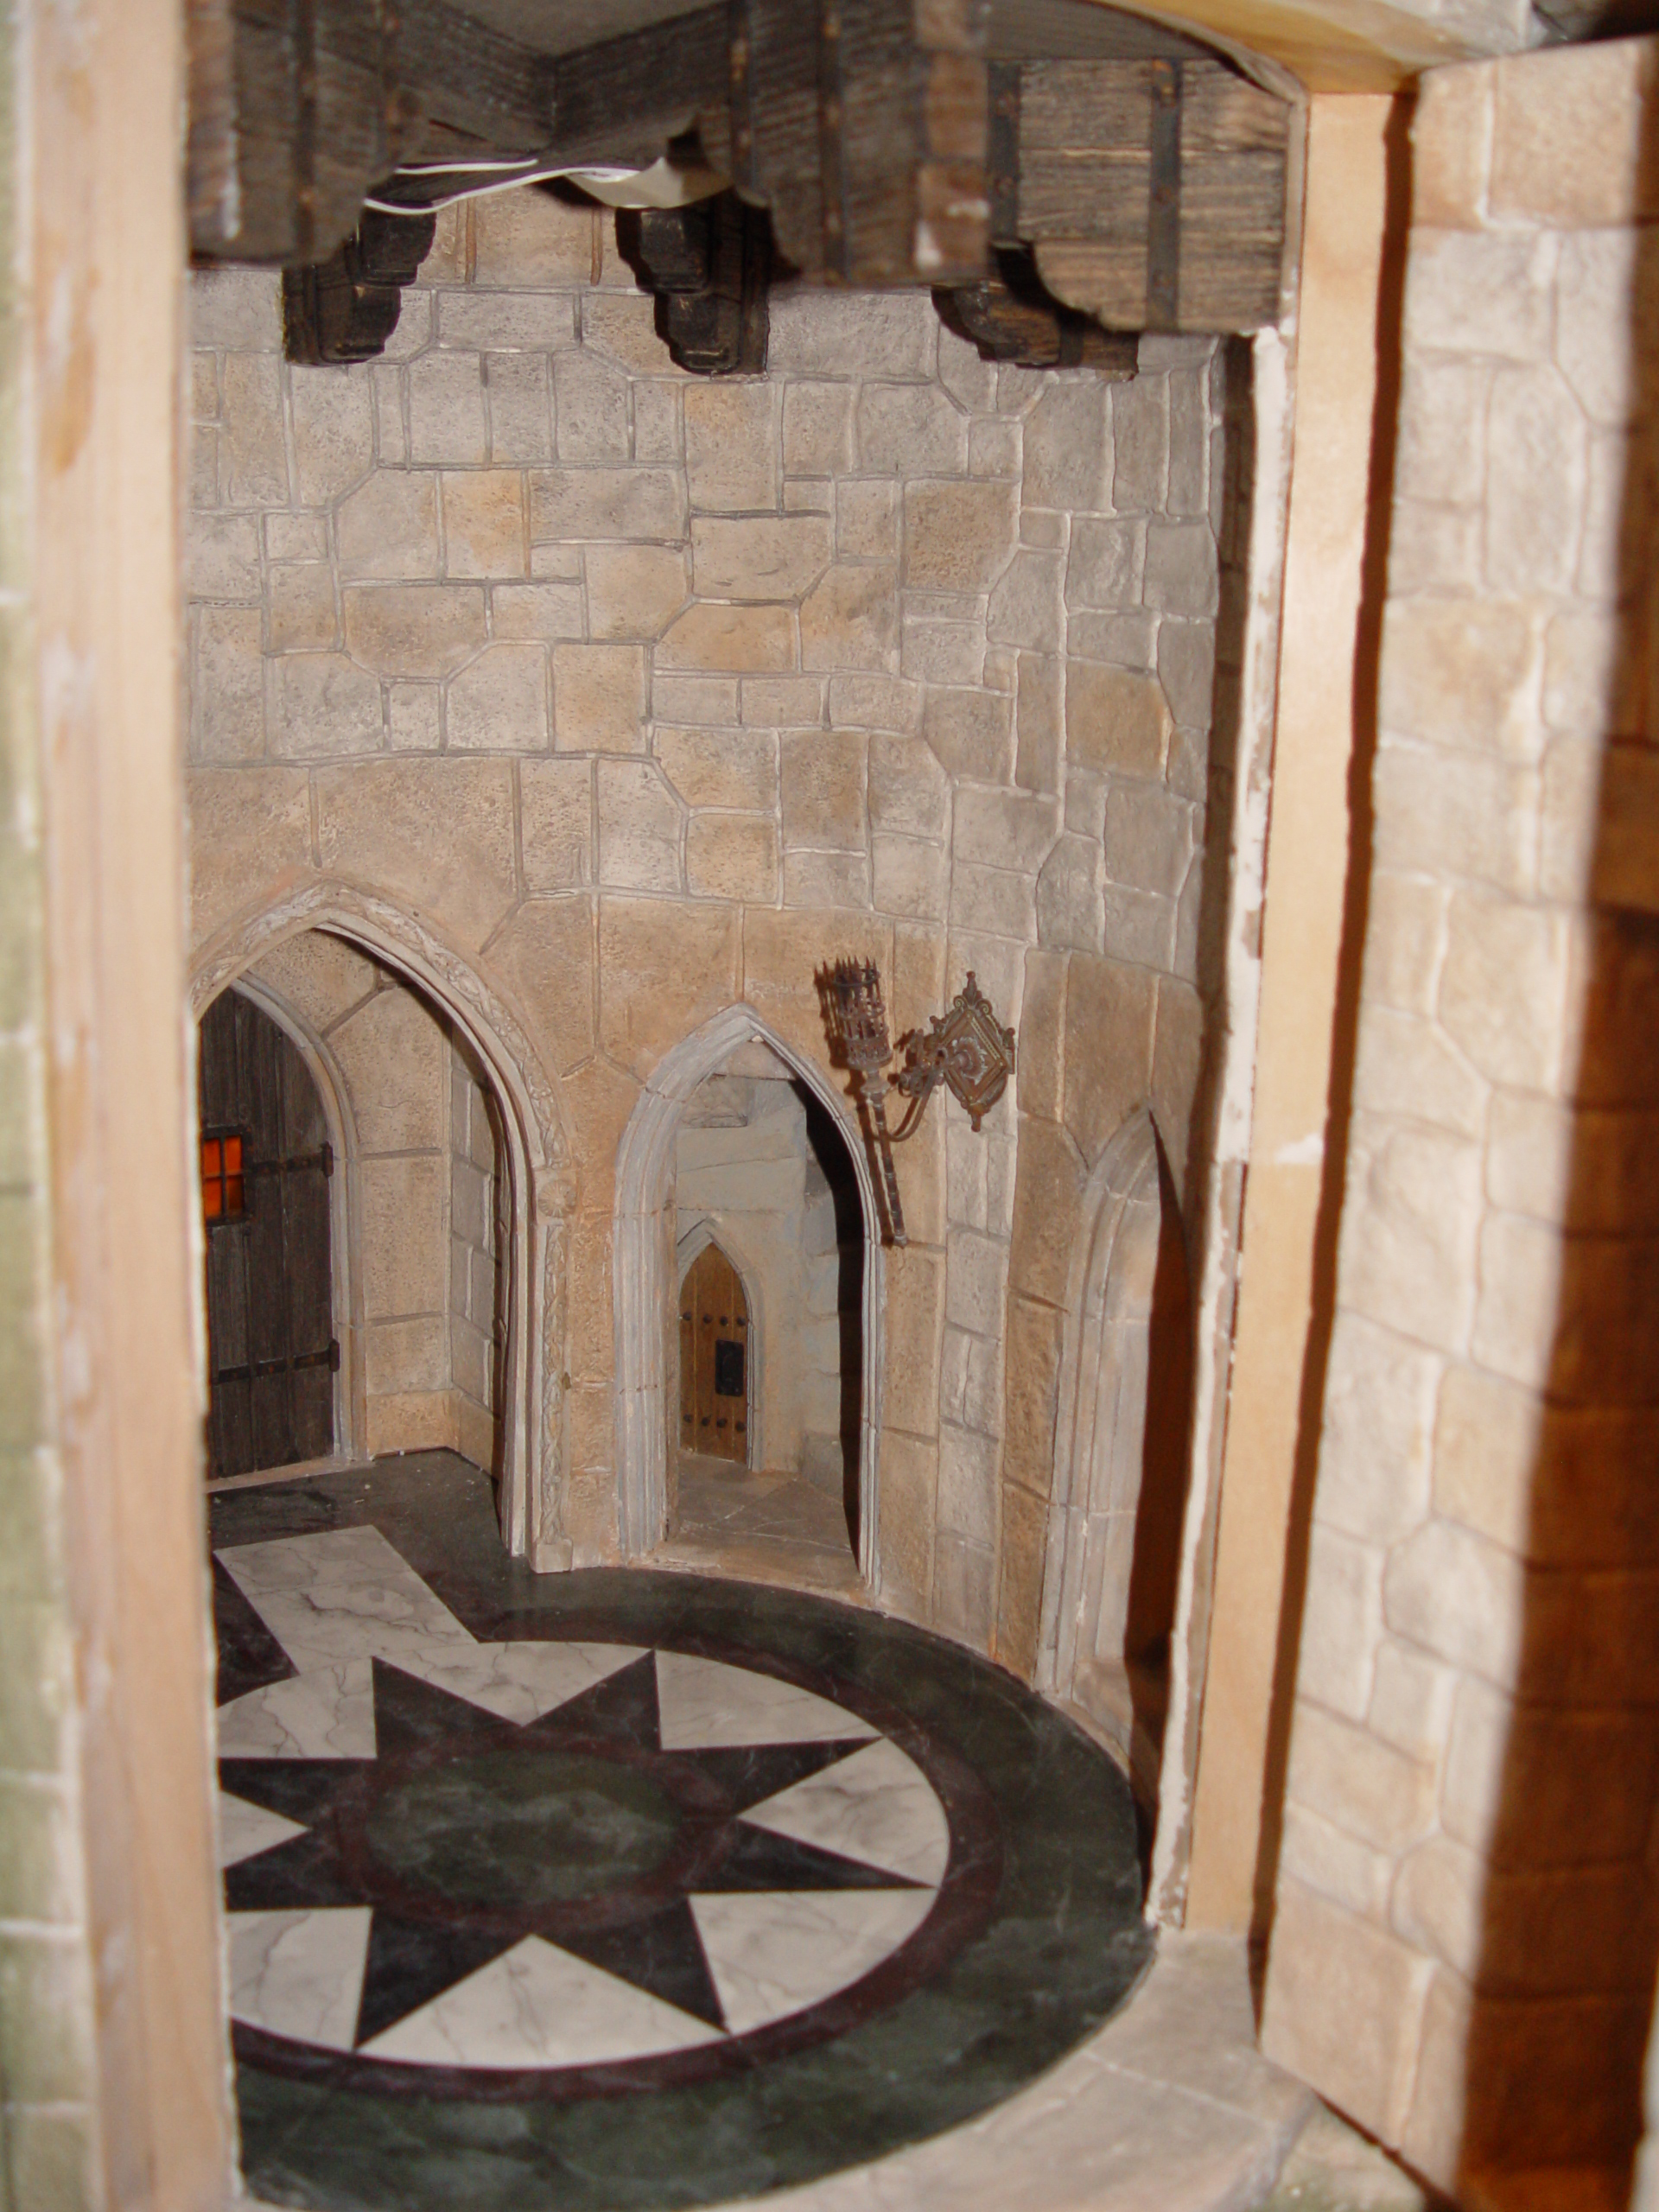 Inside Lower Tower